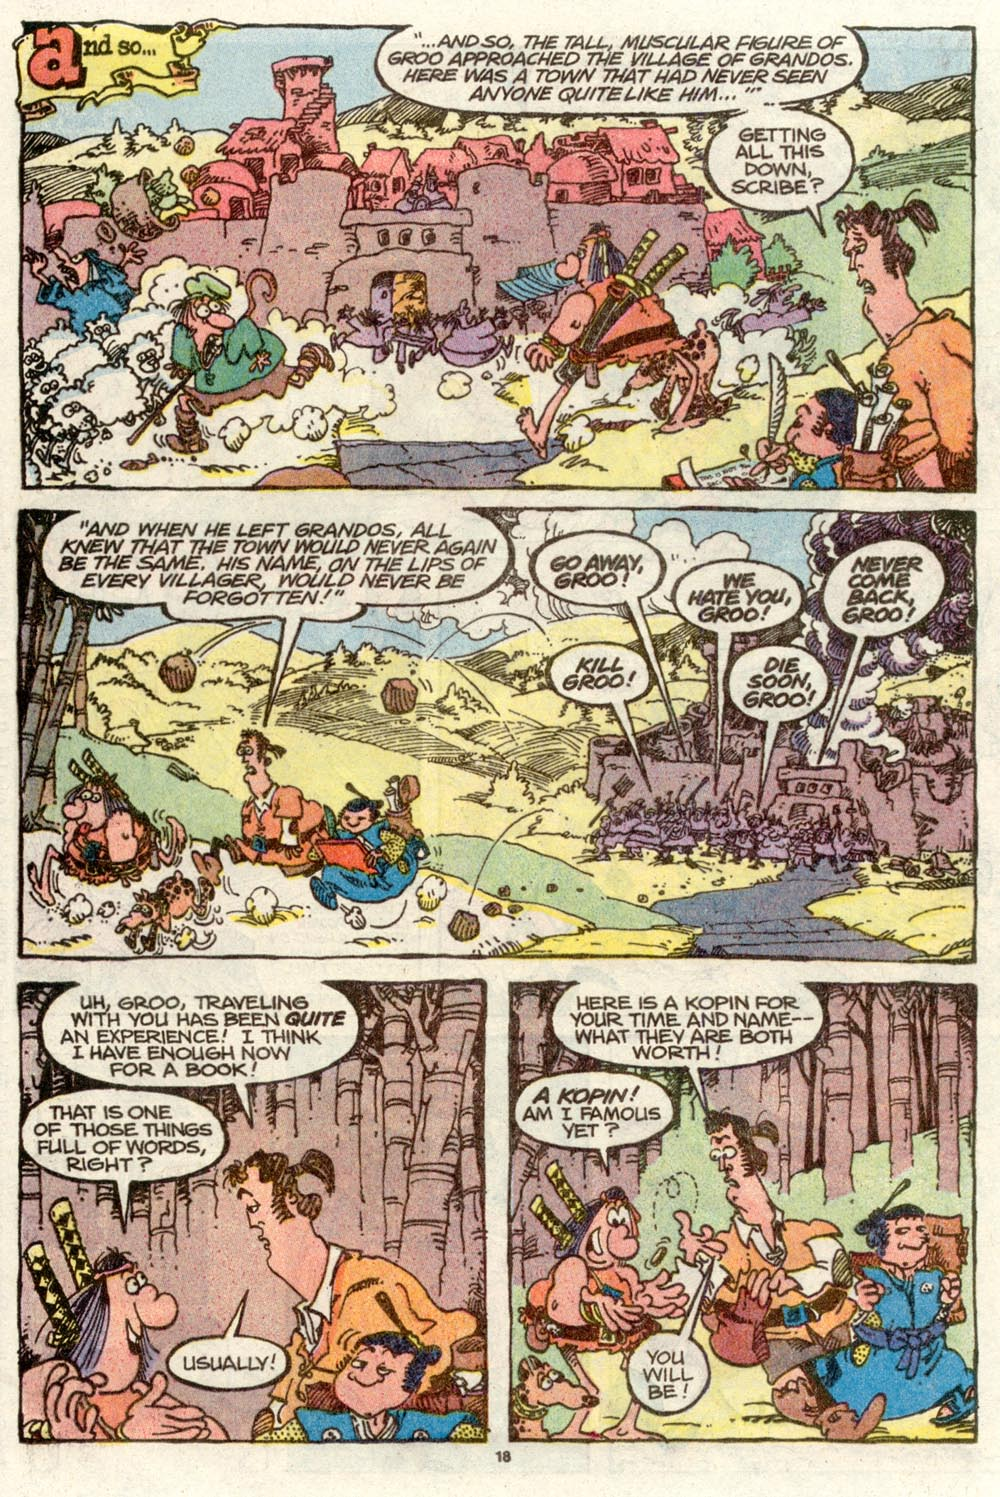 Read online Sergio Aragonés Groo the Wanderer comic -  Issue #70 - 13